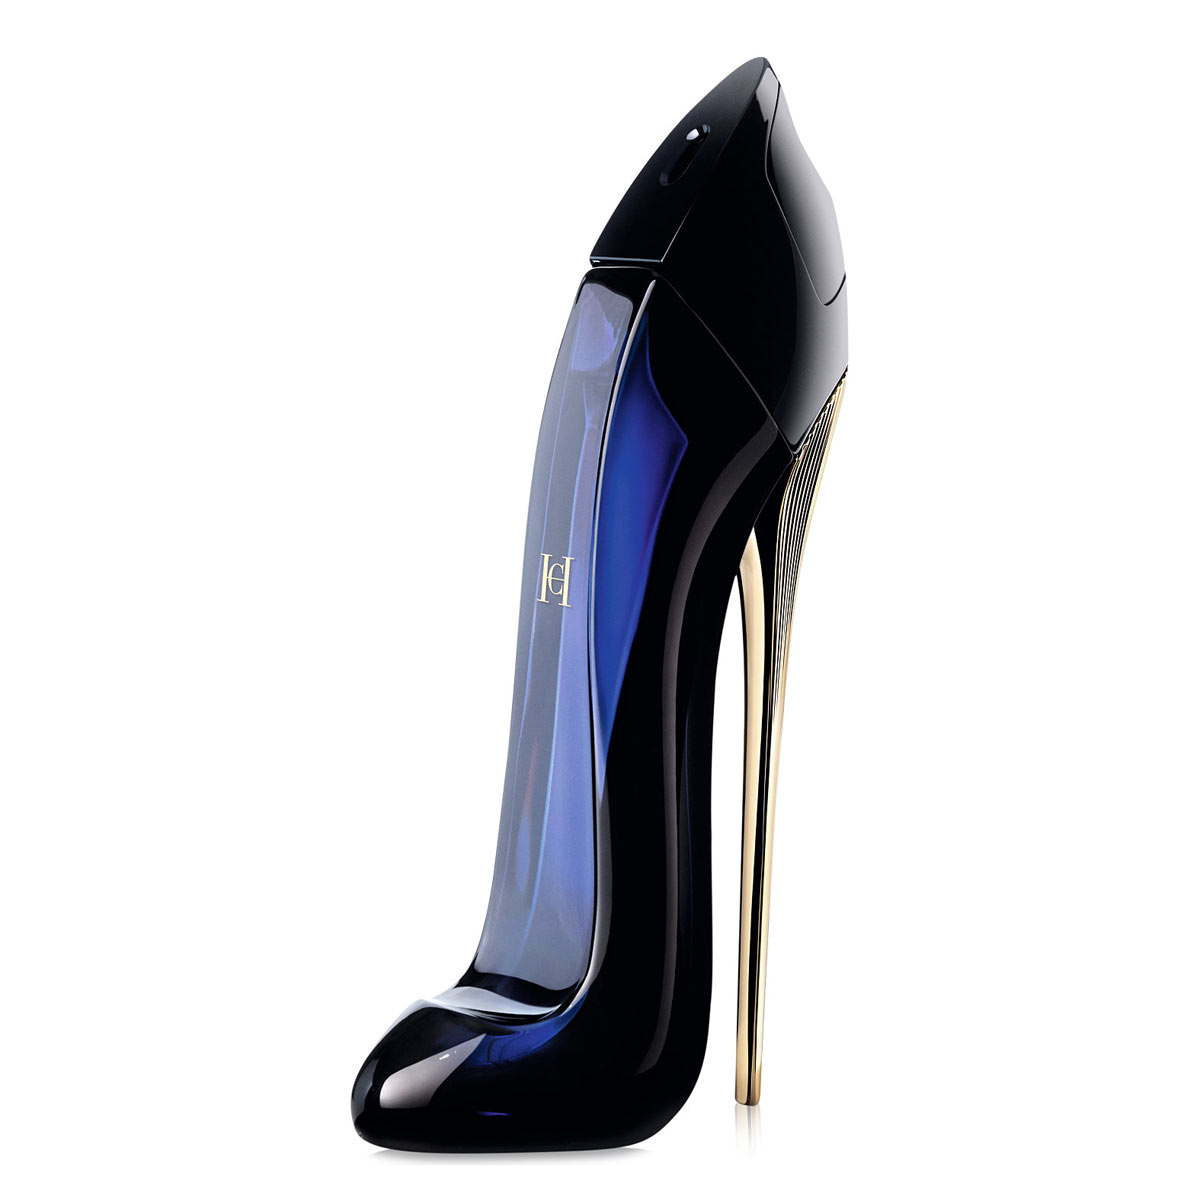 Good girl w - تستر اماراتی ادو پرفیوم زنانه کارولینا هررا مدل Good Girl حجم 80 میلی لیتر